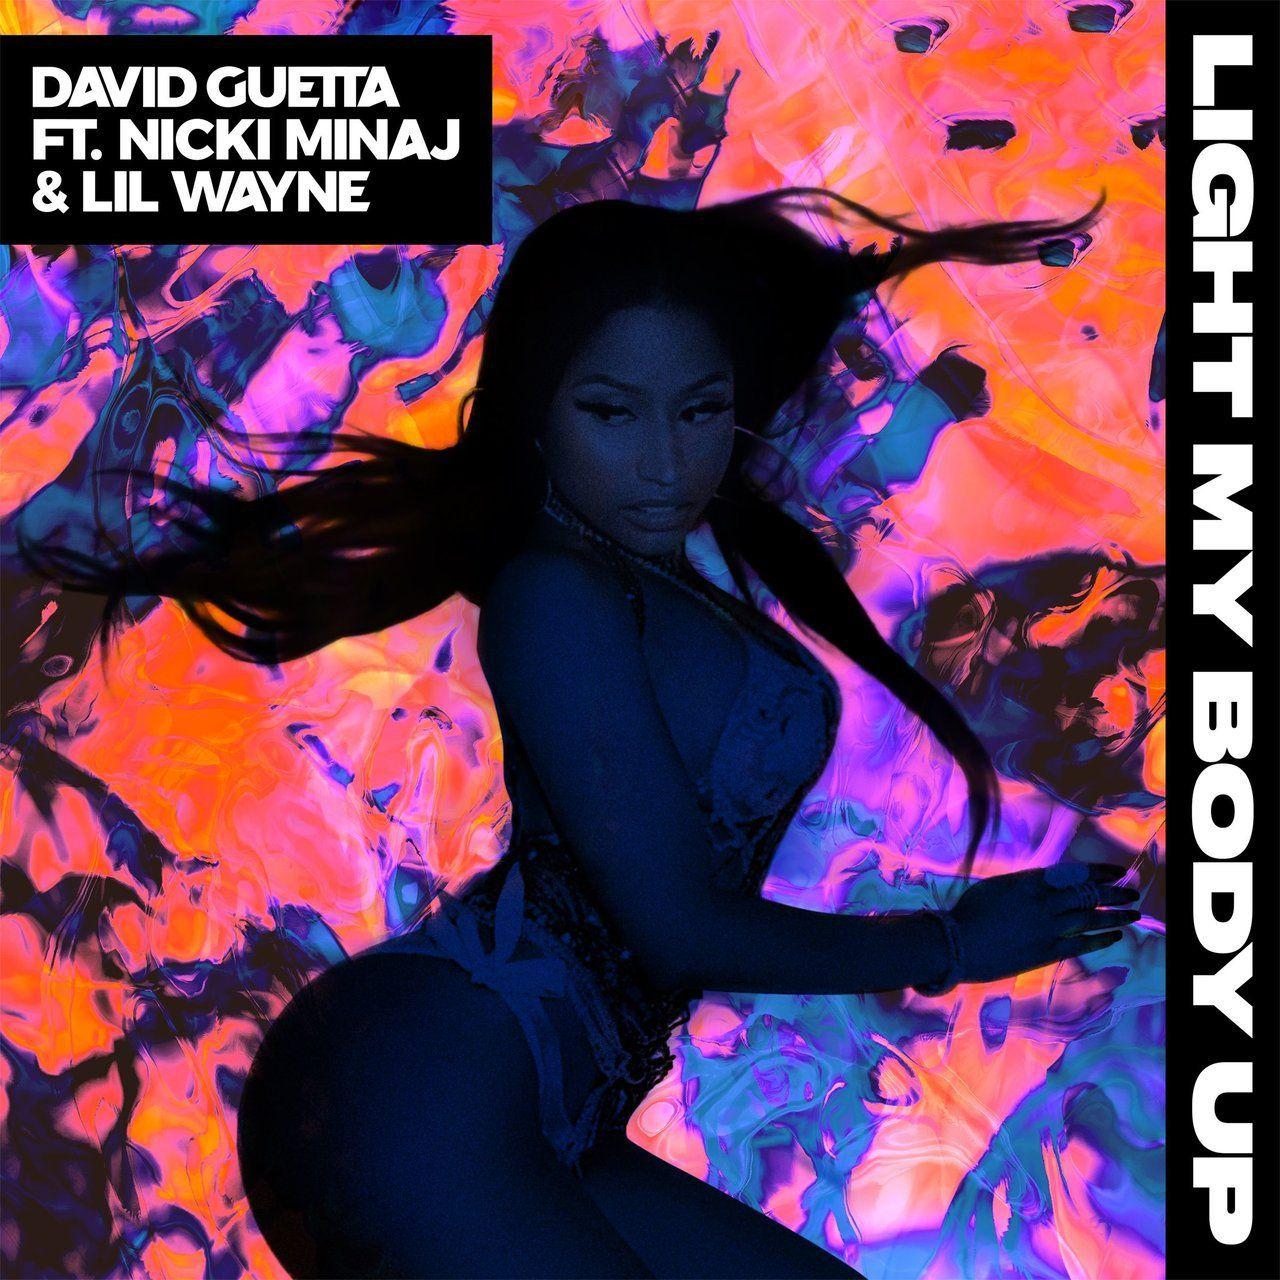 Nicki minaj lil wayne go edm on new david guetta track light my body up after teasing the song on social media and surpassing aretha franklin earlier